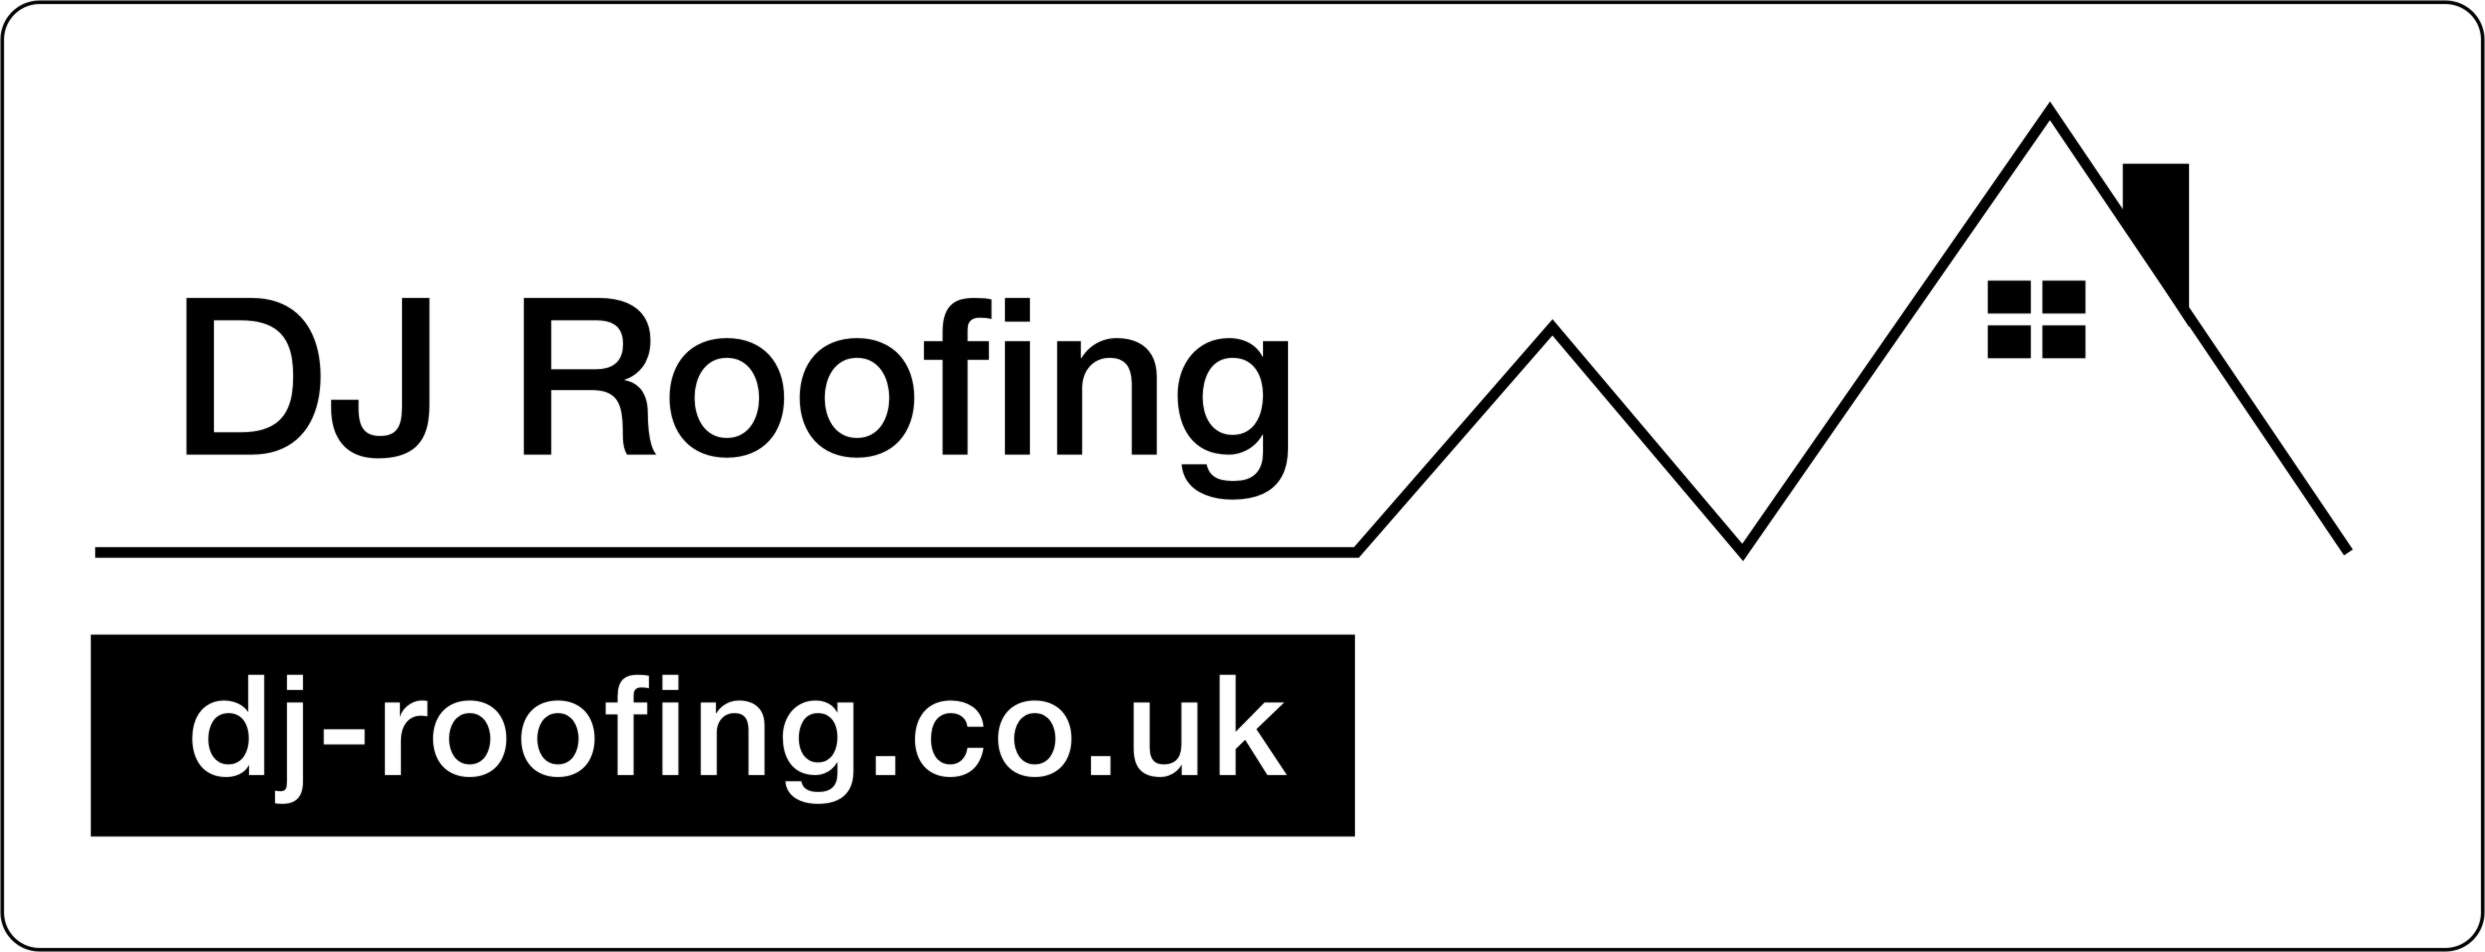 DJ Roofing